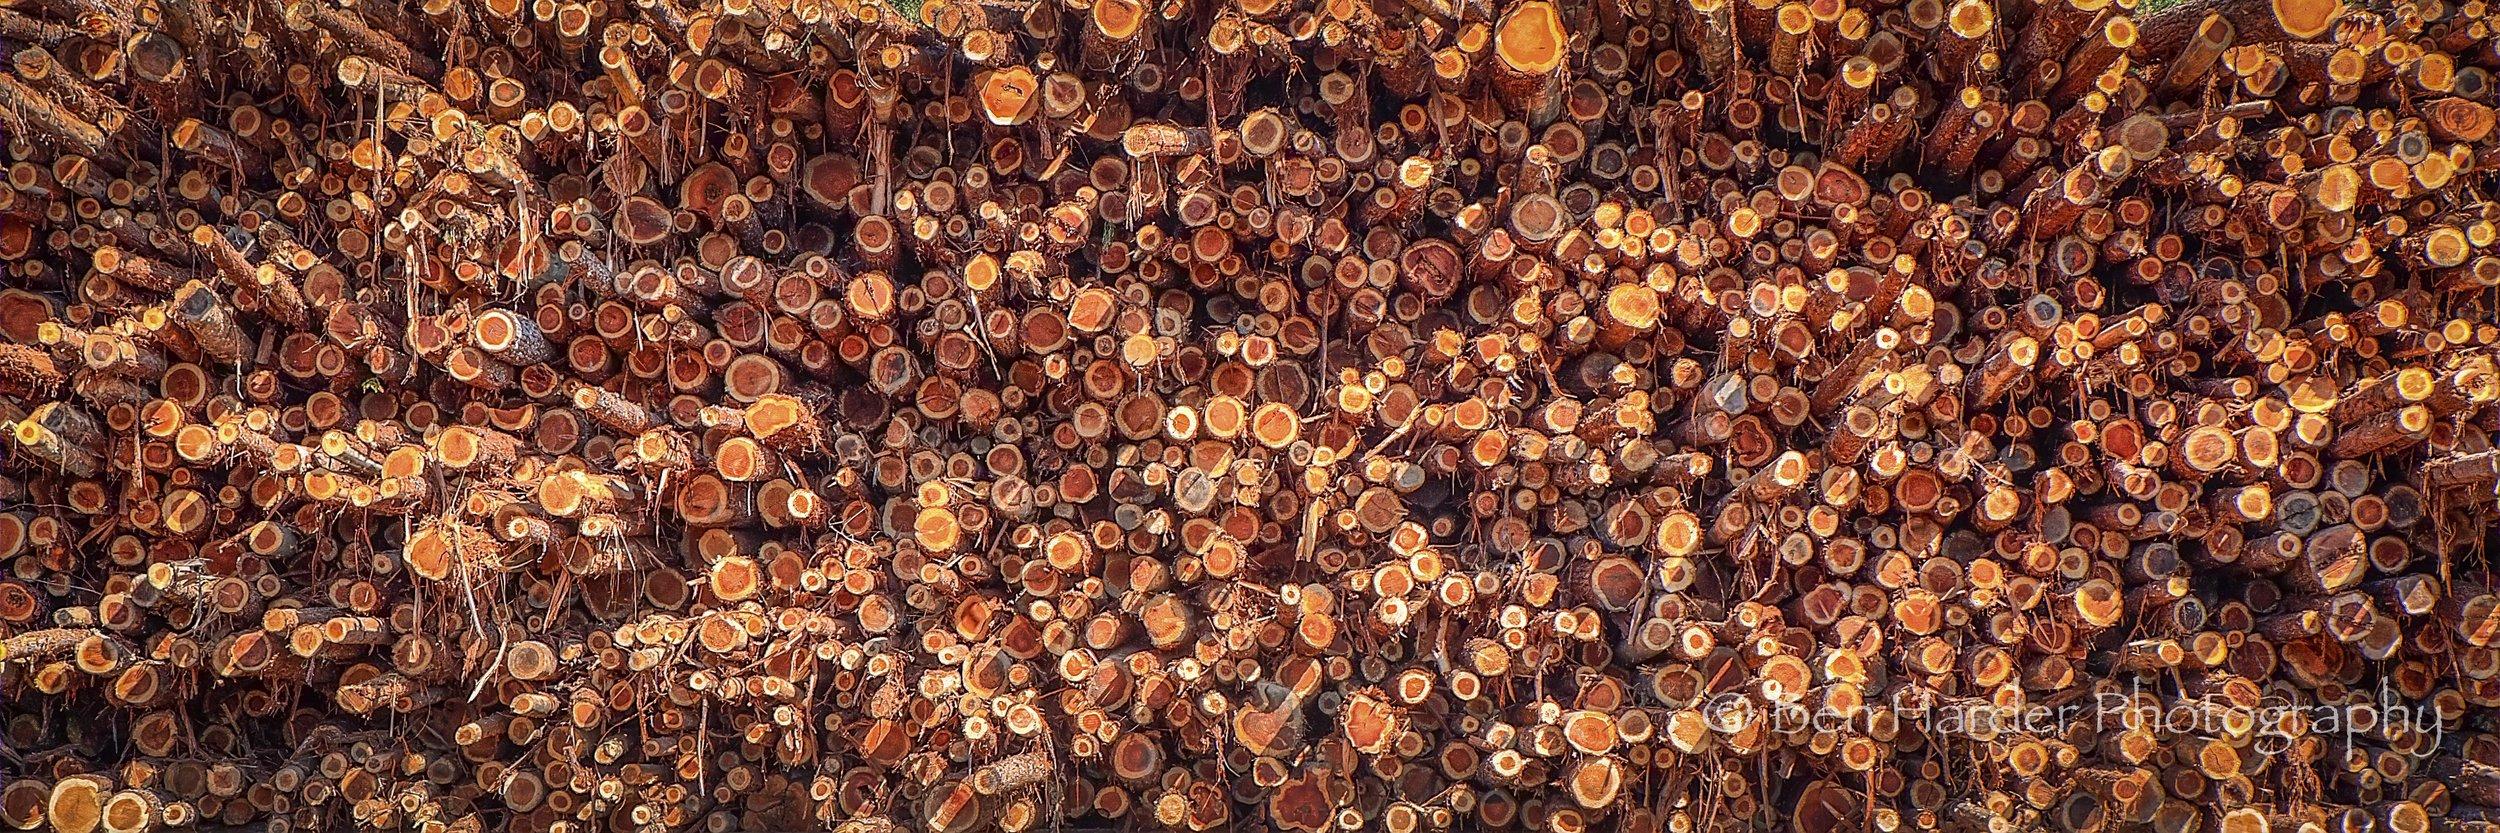 """Lincoln Logs"" - Northern California"